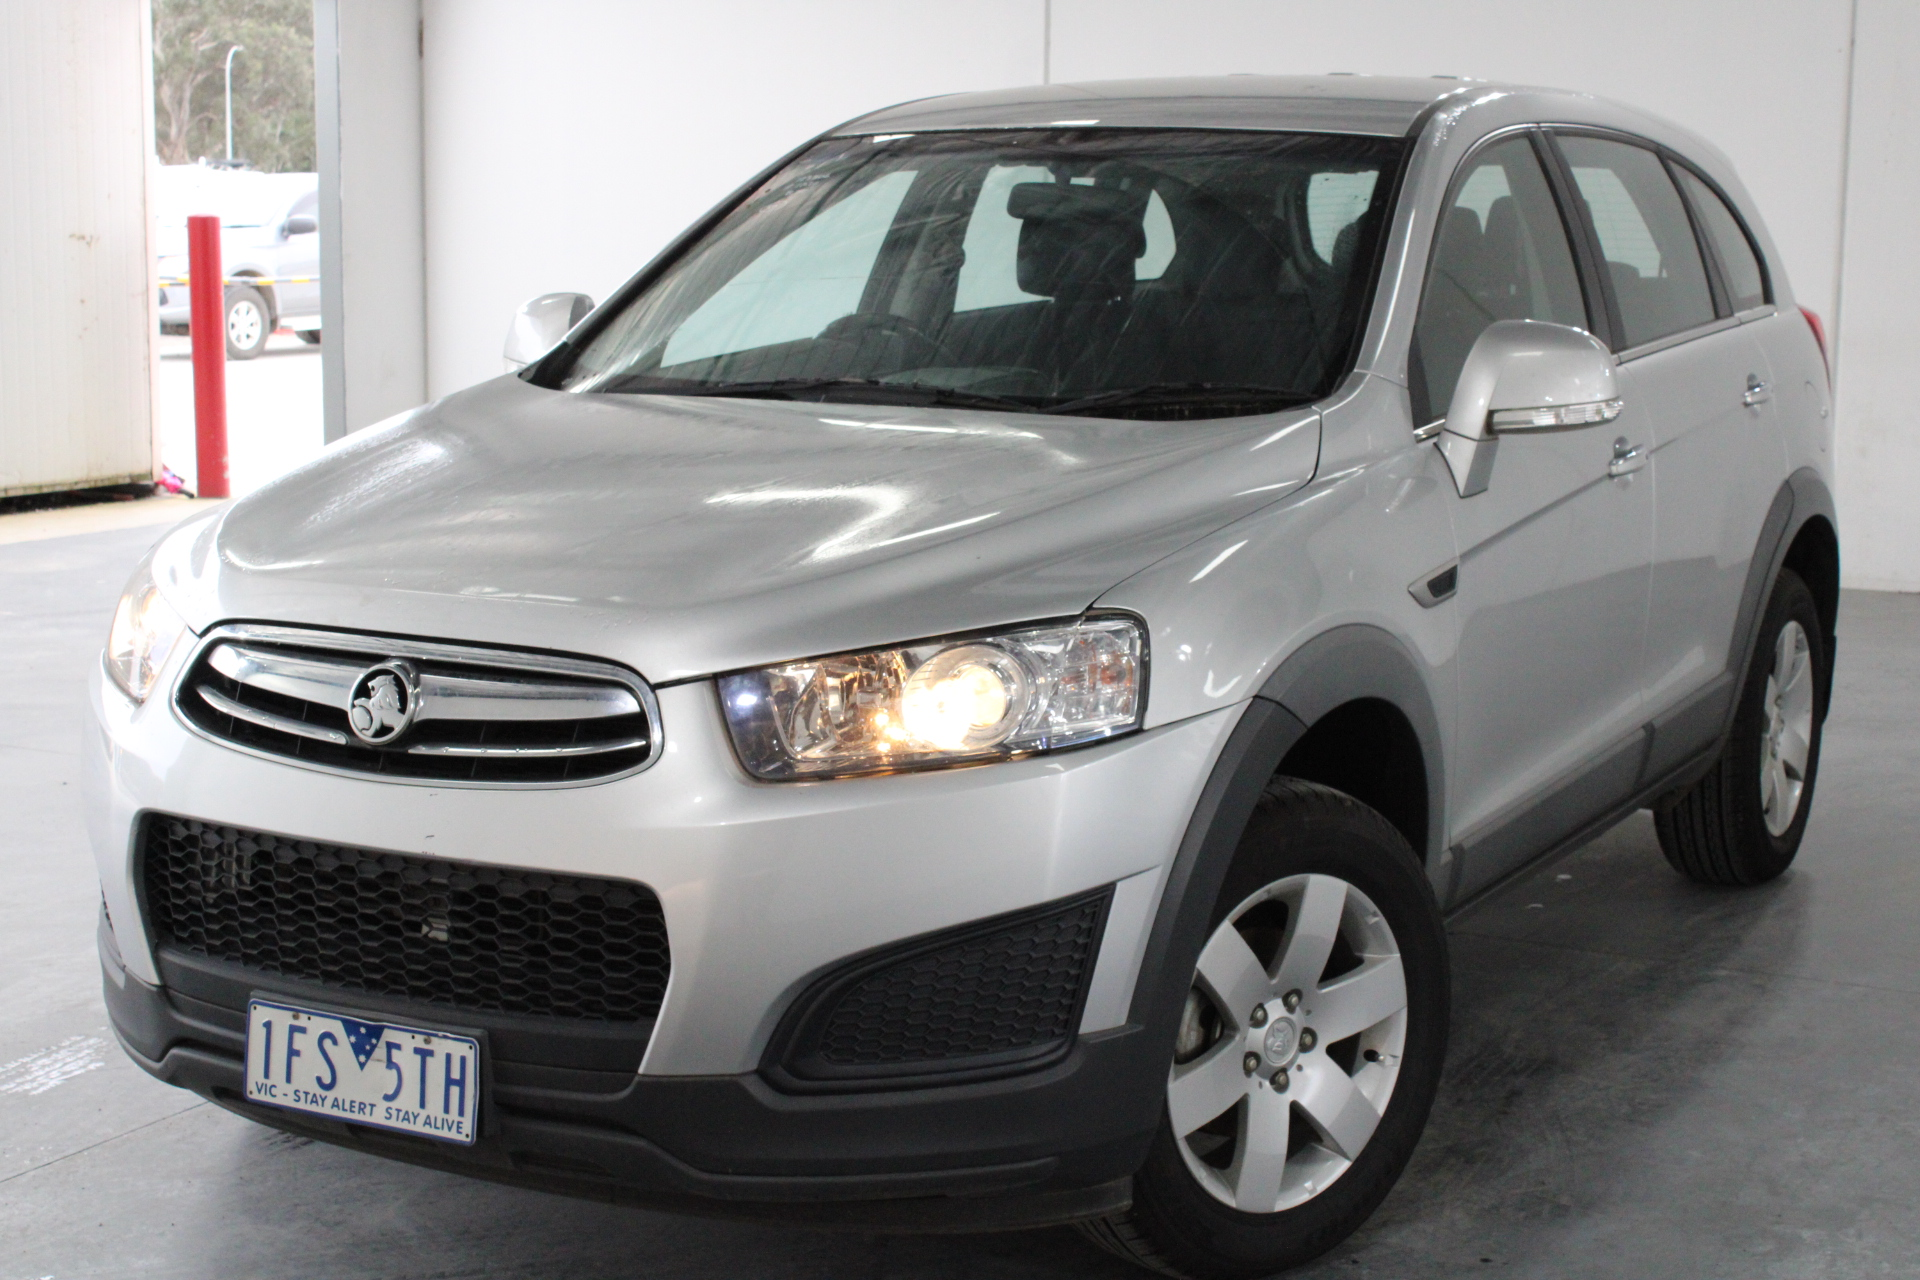 2015 Holden Captiva 7 LS 2WD CG II Automatic 7 Seats Wagon